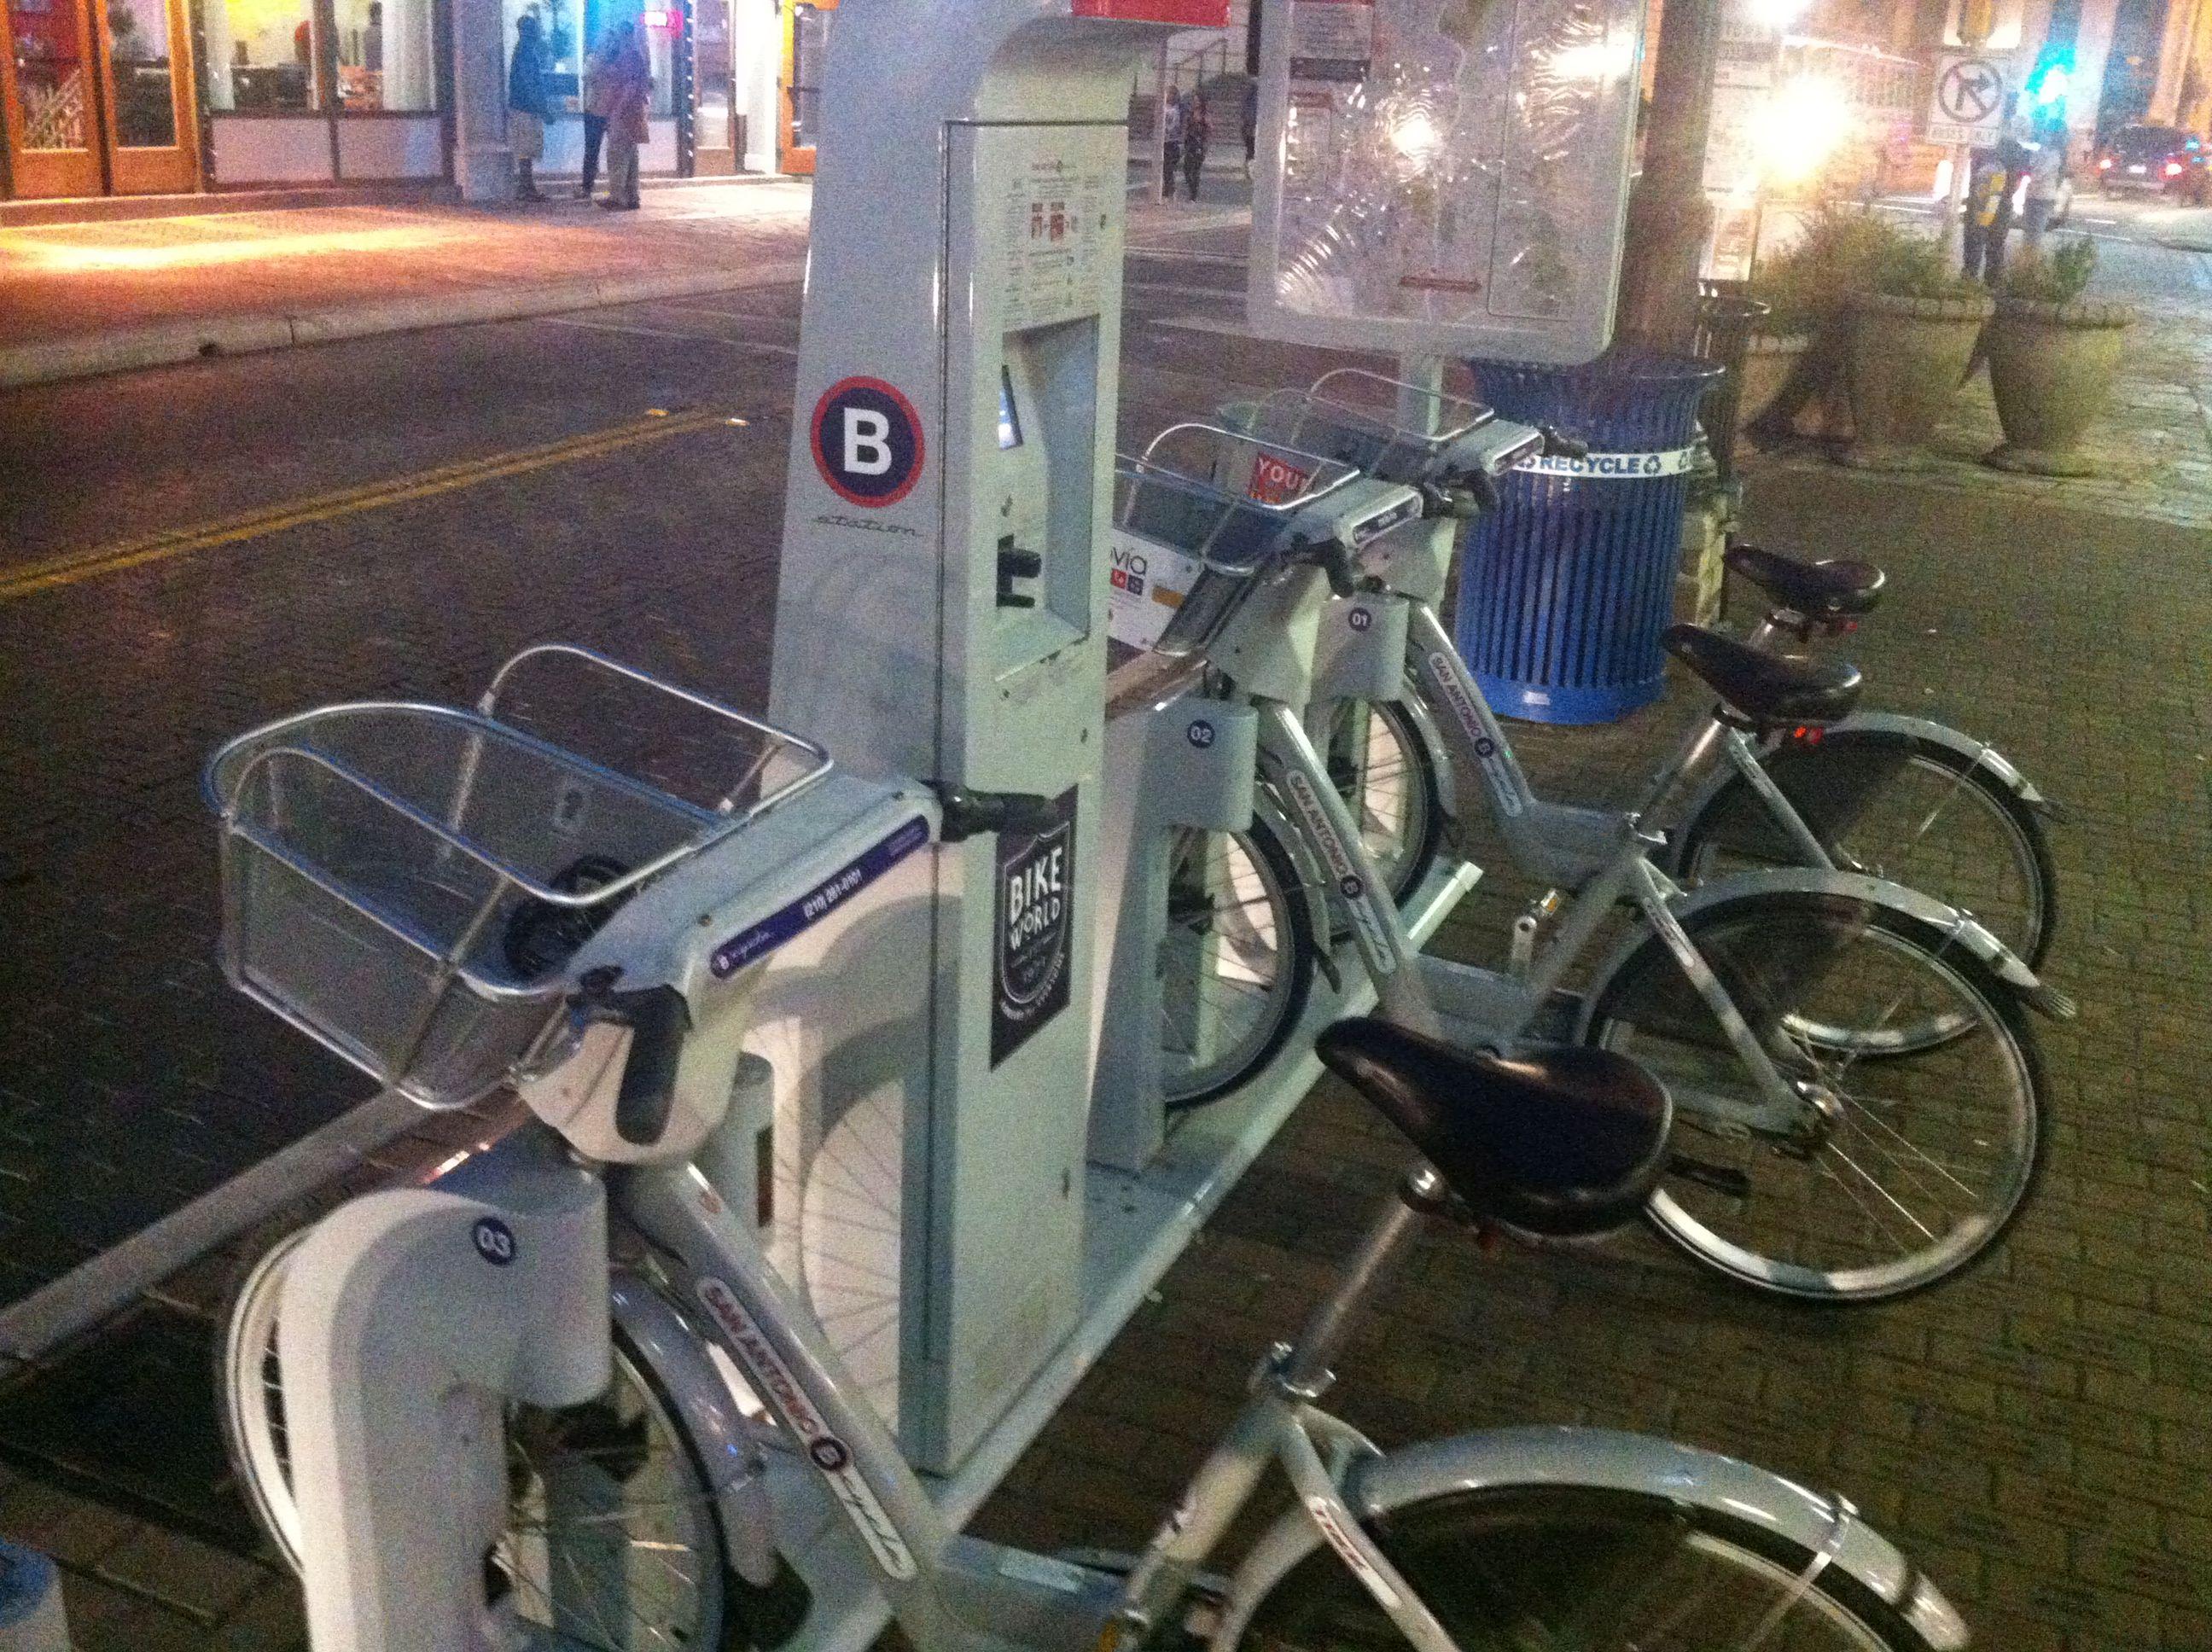 Bicycle rental vending machine downtown san antonio tx